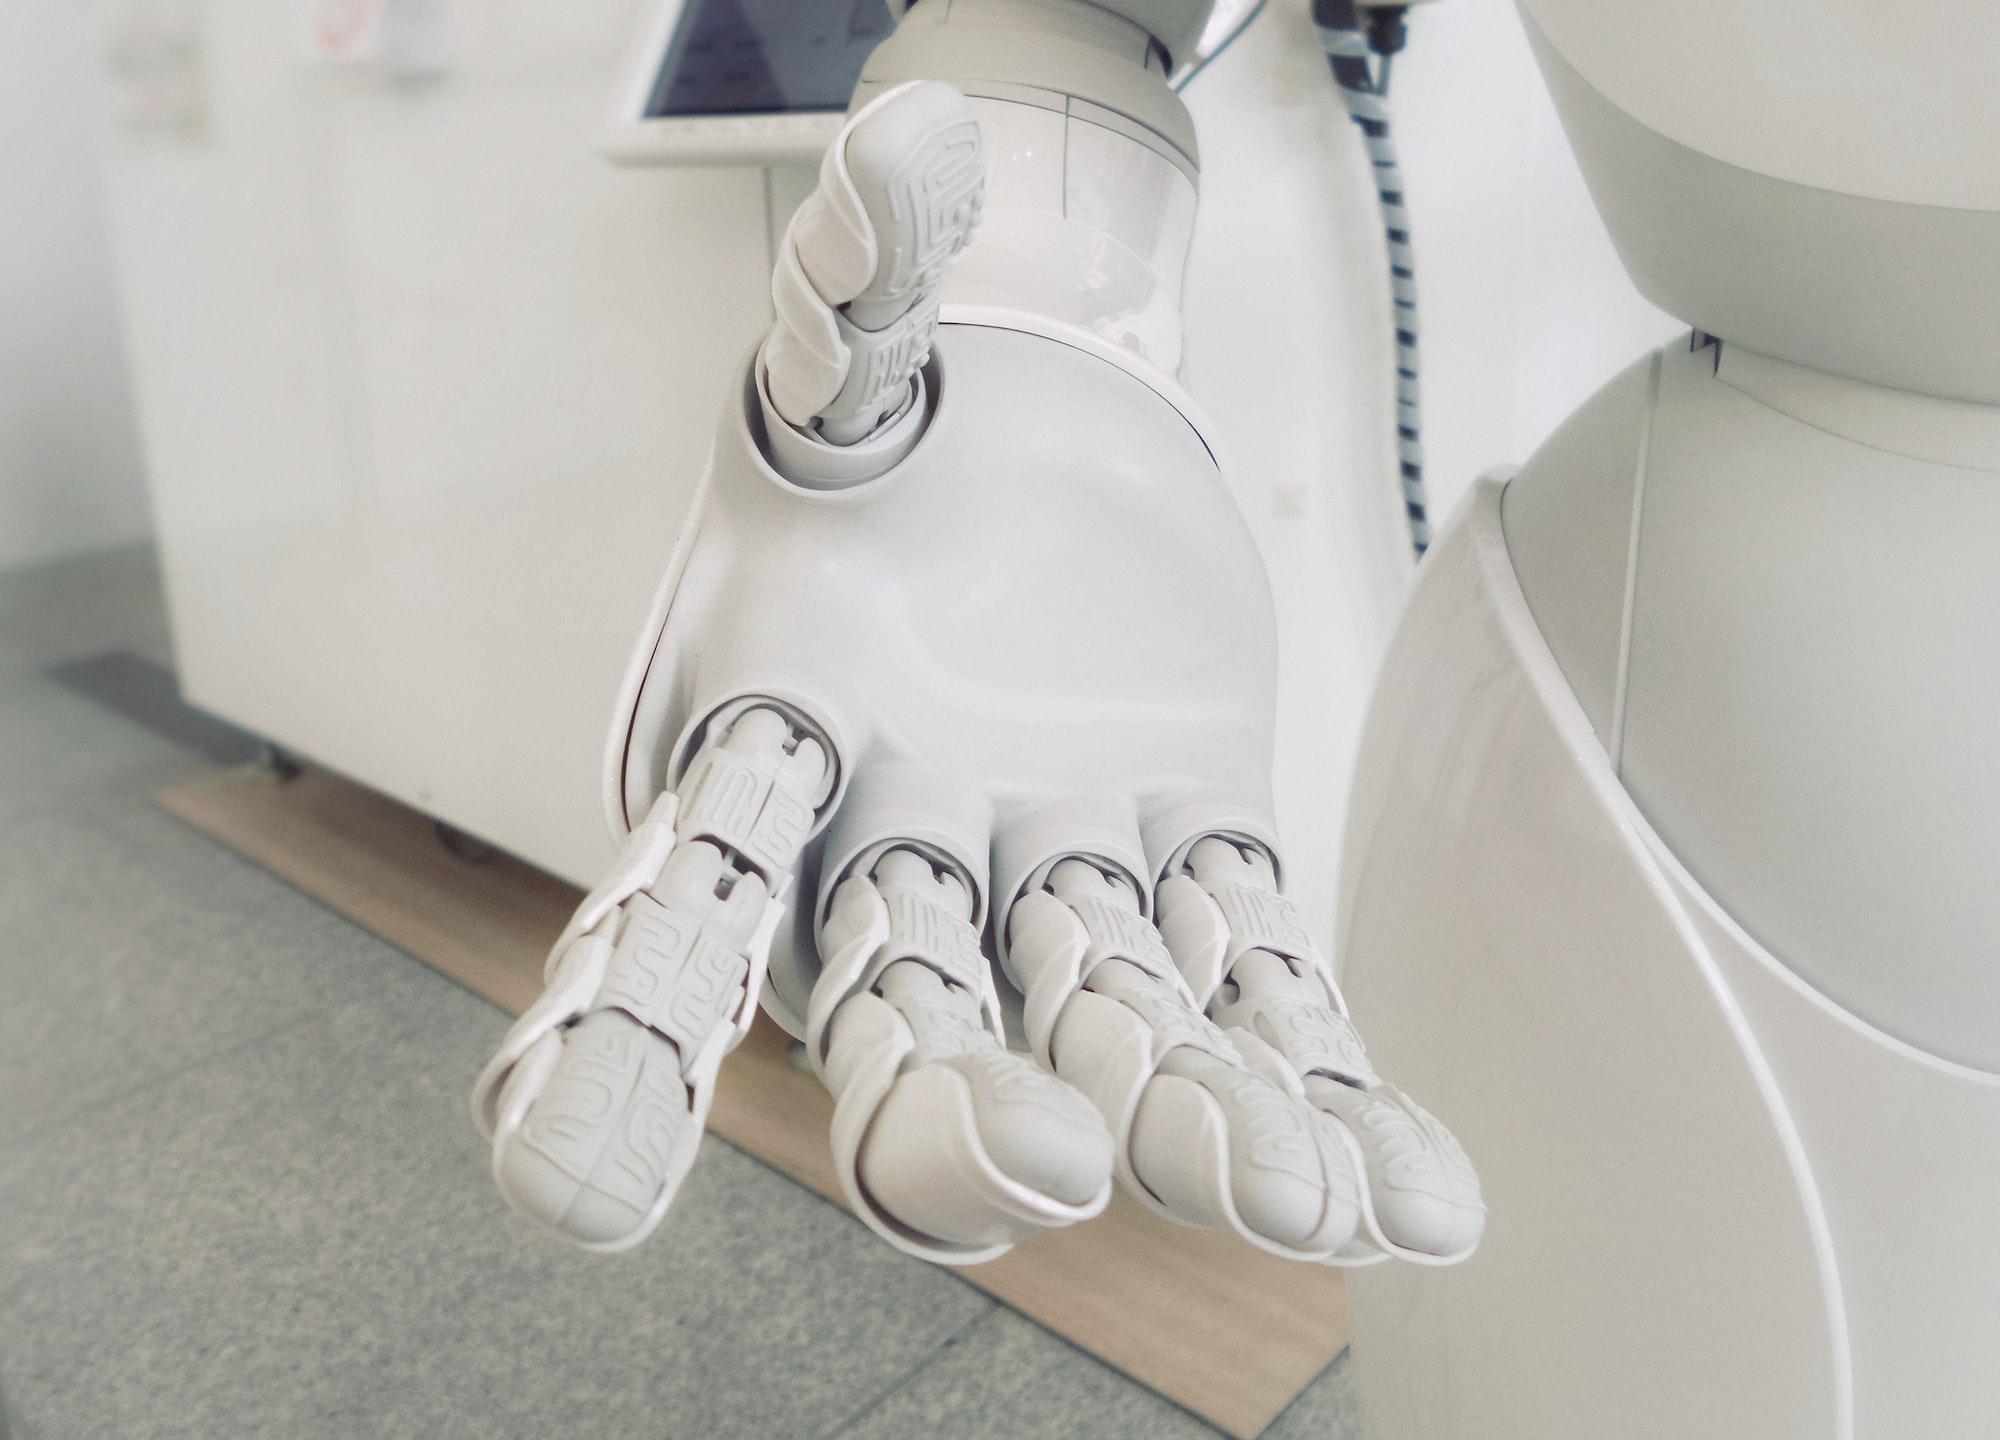 De villanos a héroes: la robotización post pandemia